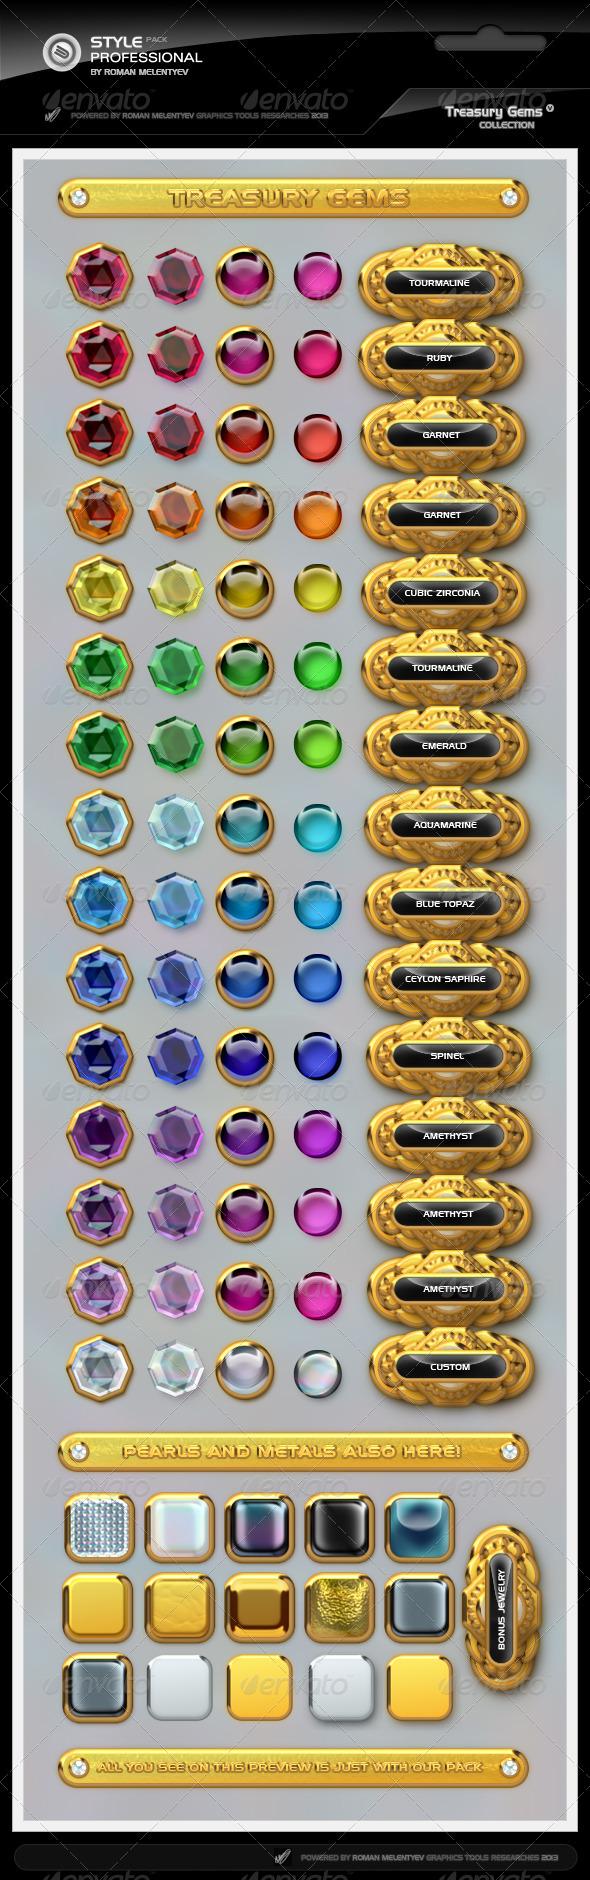 GraphicRiver Treasure Gems Styles Pro 5286762